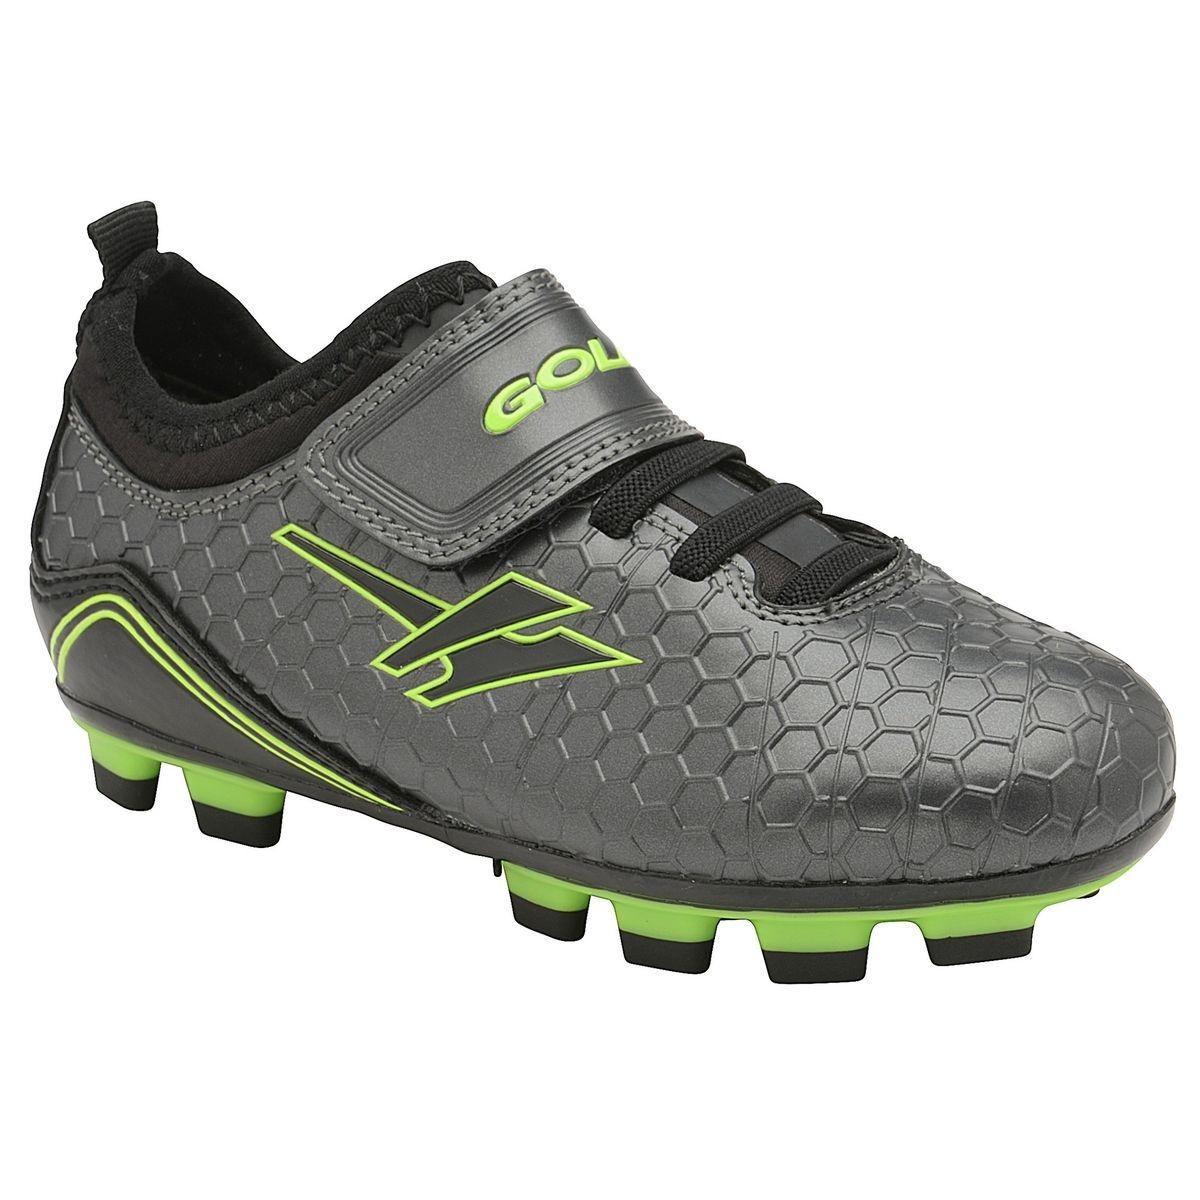 Chaussures de football APEX BLADE TOUCH